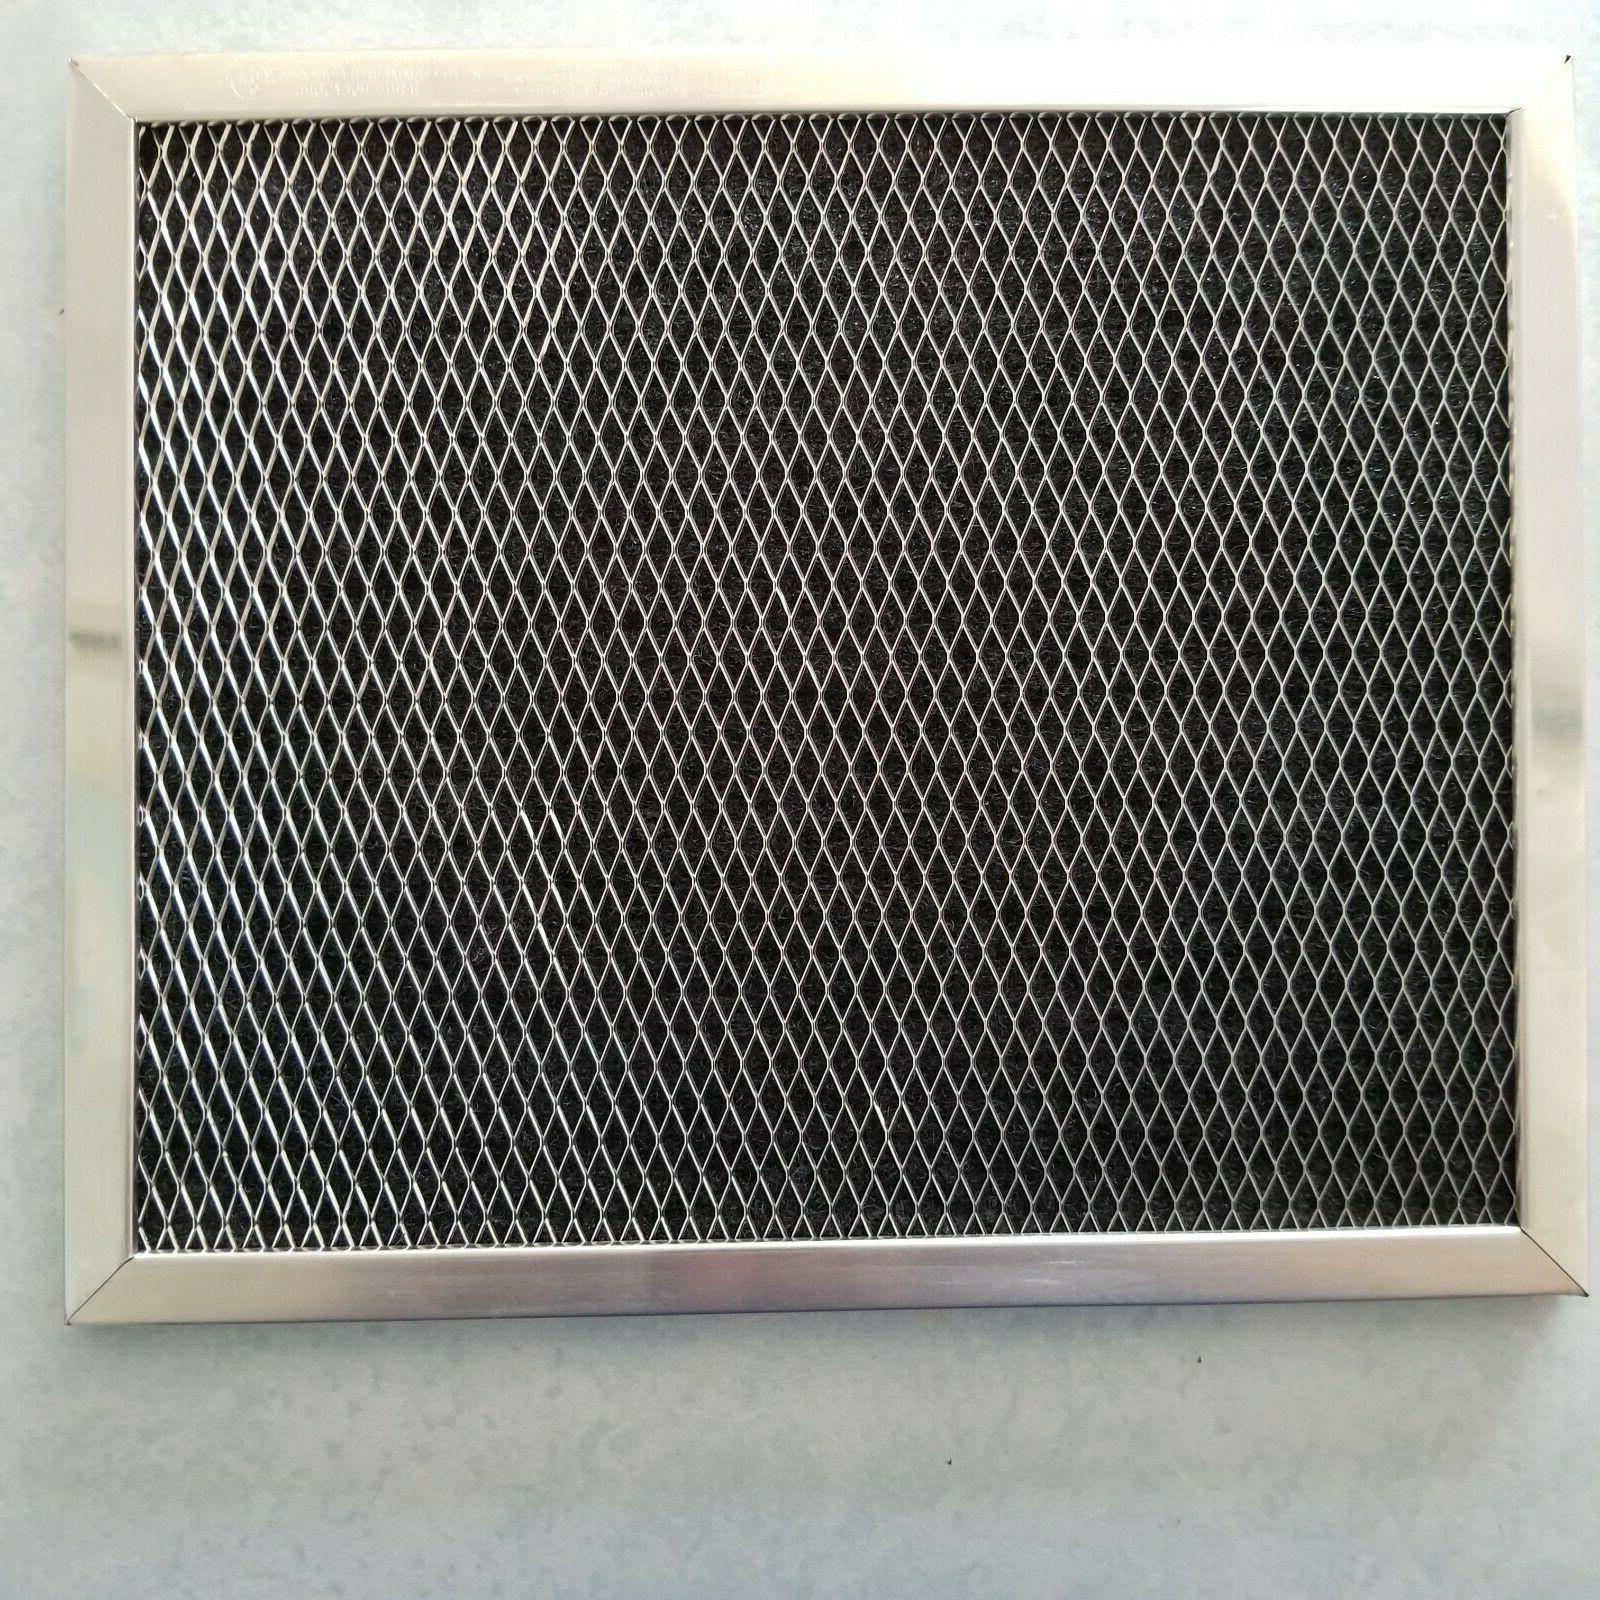 Broan/Nutone Hood Filter 97007696, Gemline